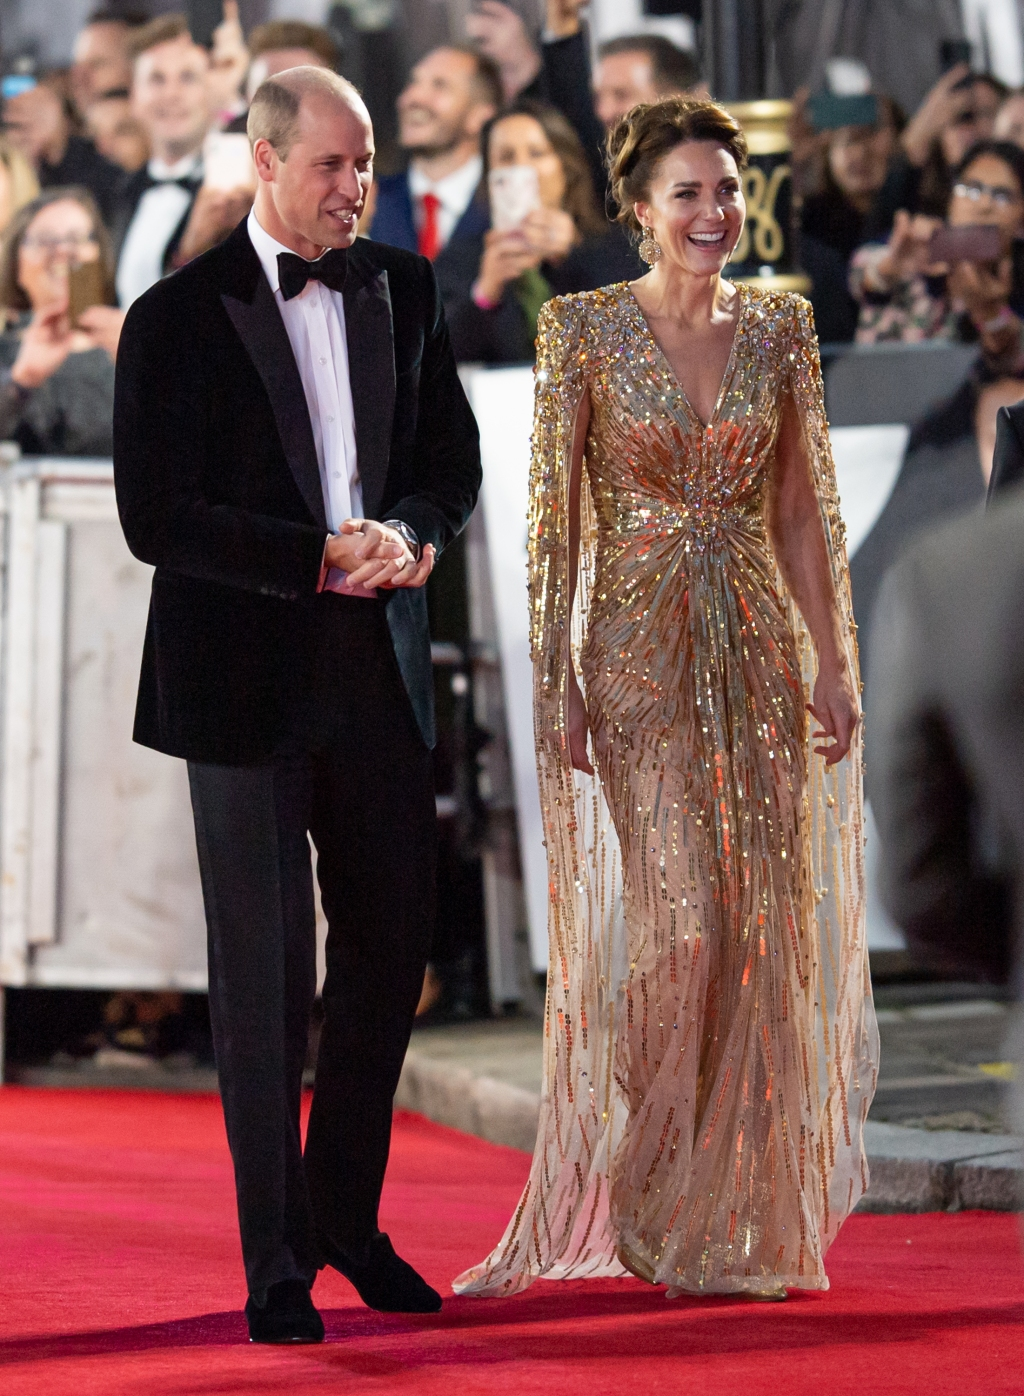 Kate Middleton No Time To Die premiere